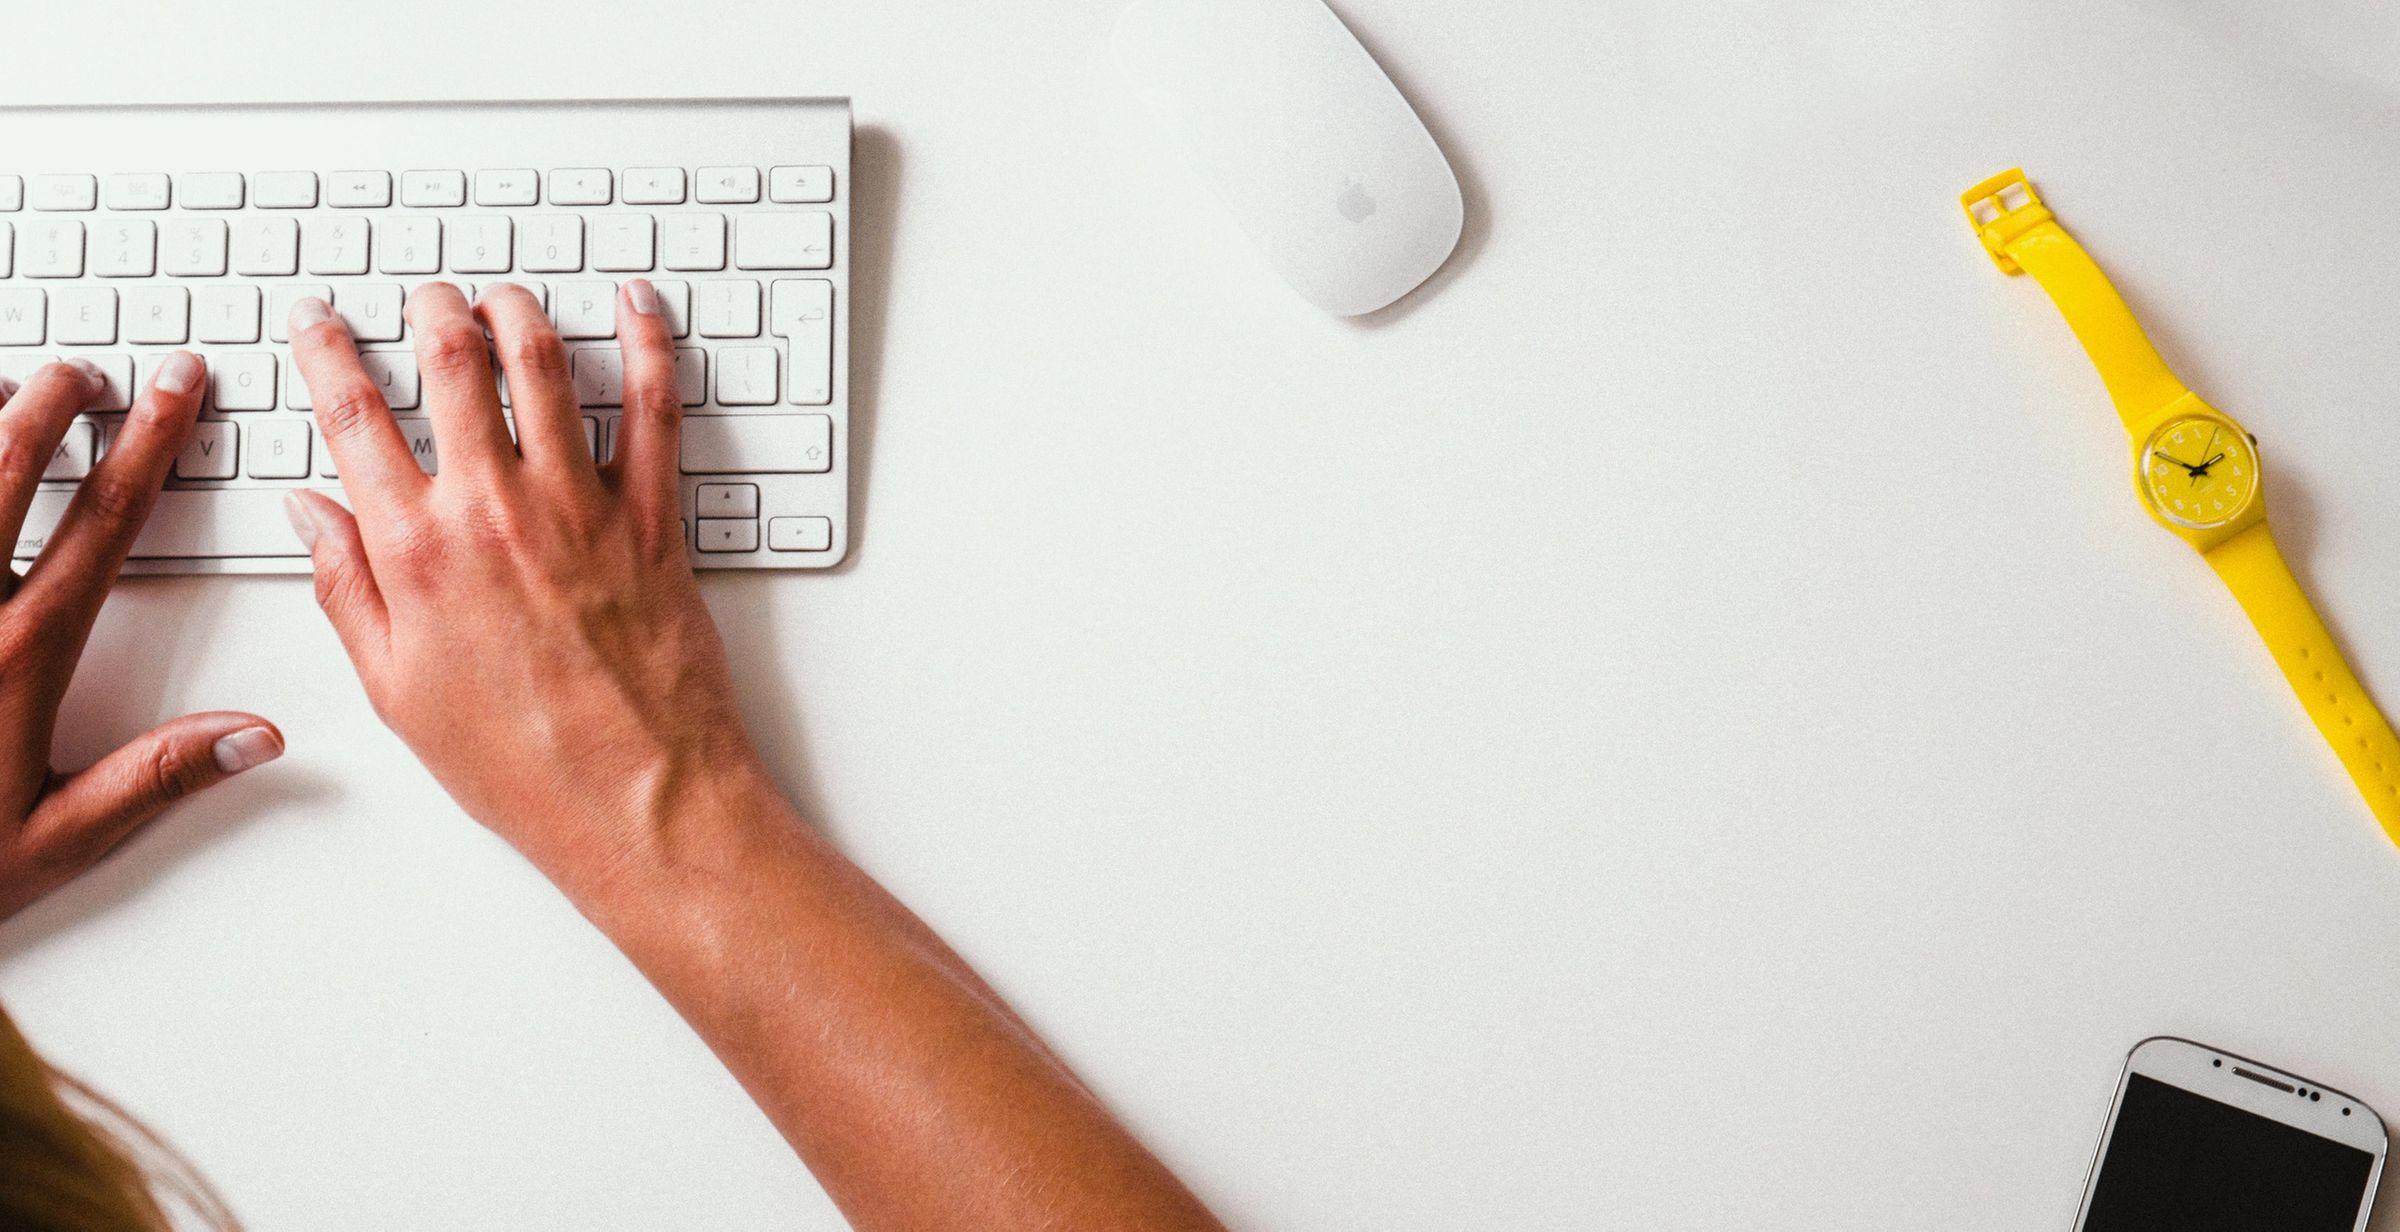 DAILY FREE FOREX SIGNALS FOR 13-09-2019 | Форекс – Сообщество Трейдеров |إشارات الفوركس|외환 신호